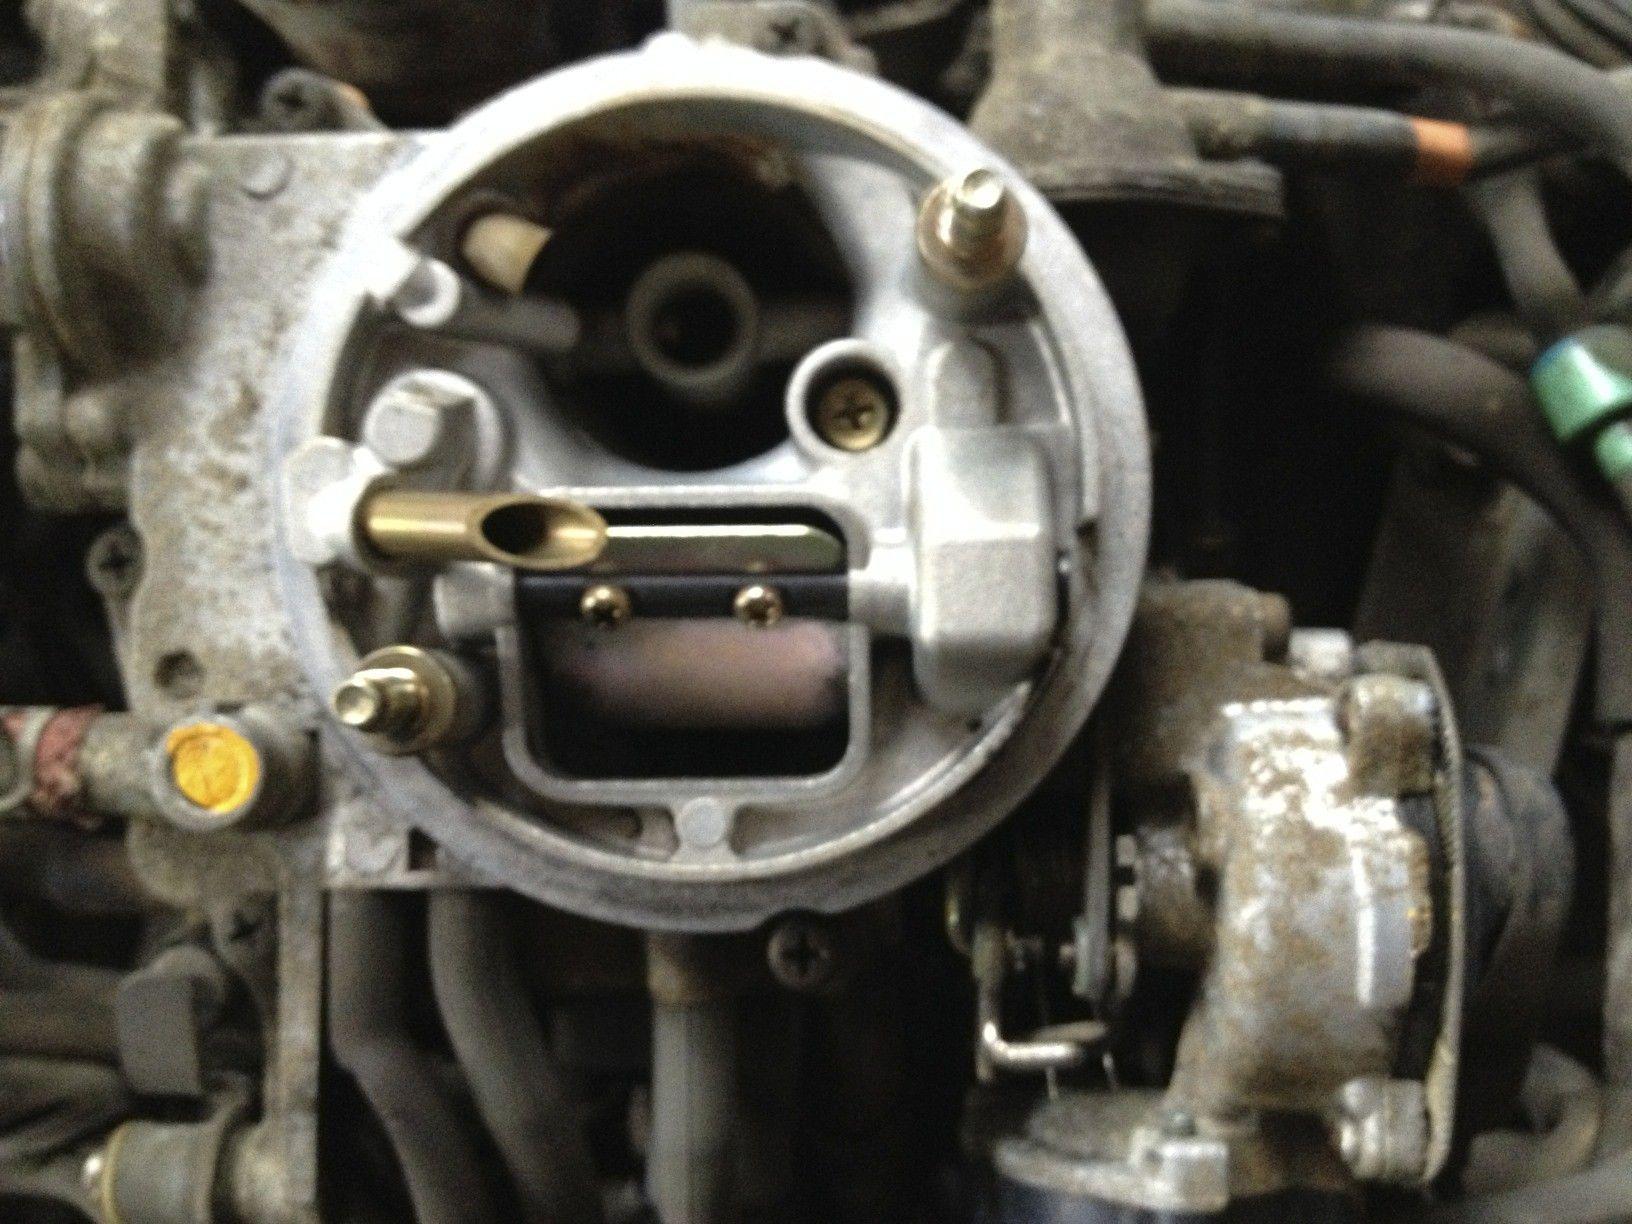 1987 Honda Accord Engine Diagram In 2021 Honda Accord Honda Shadow Cree Led Light Bar